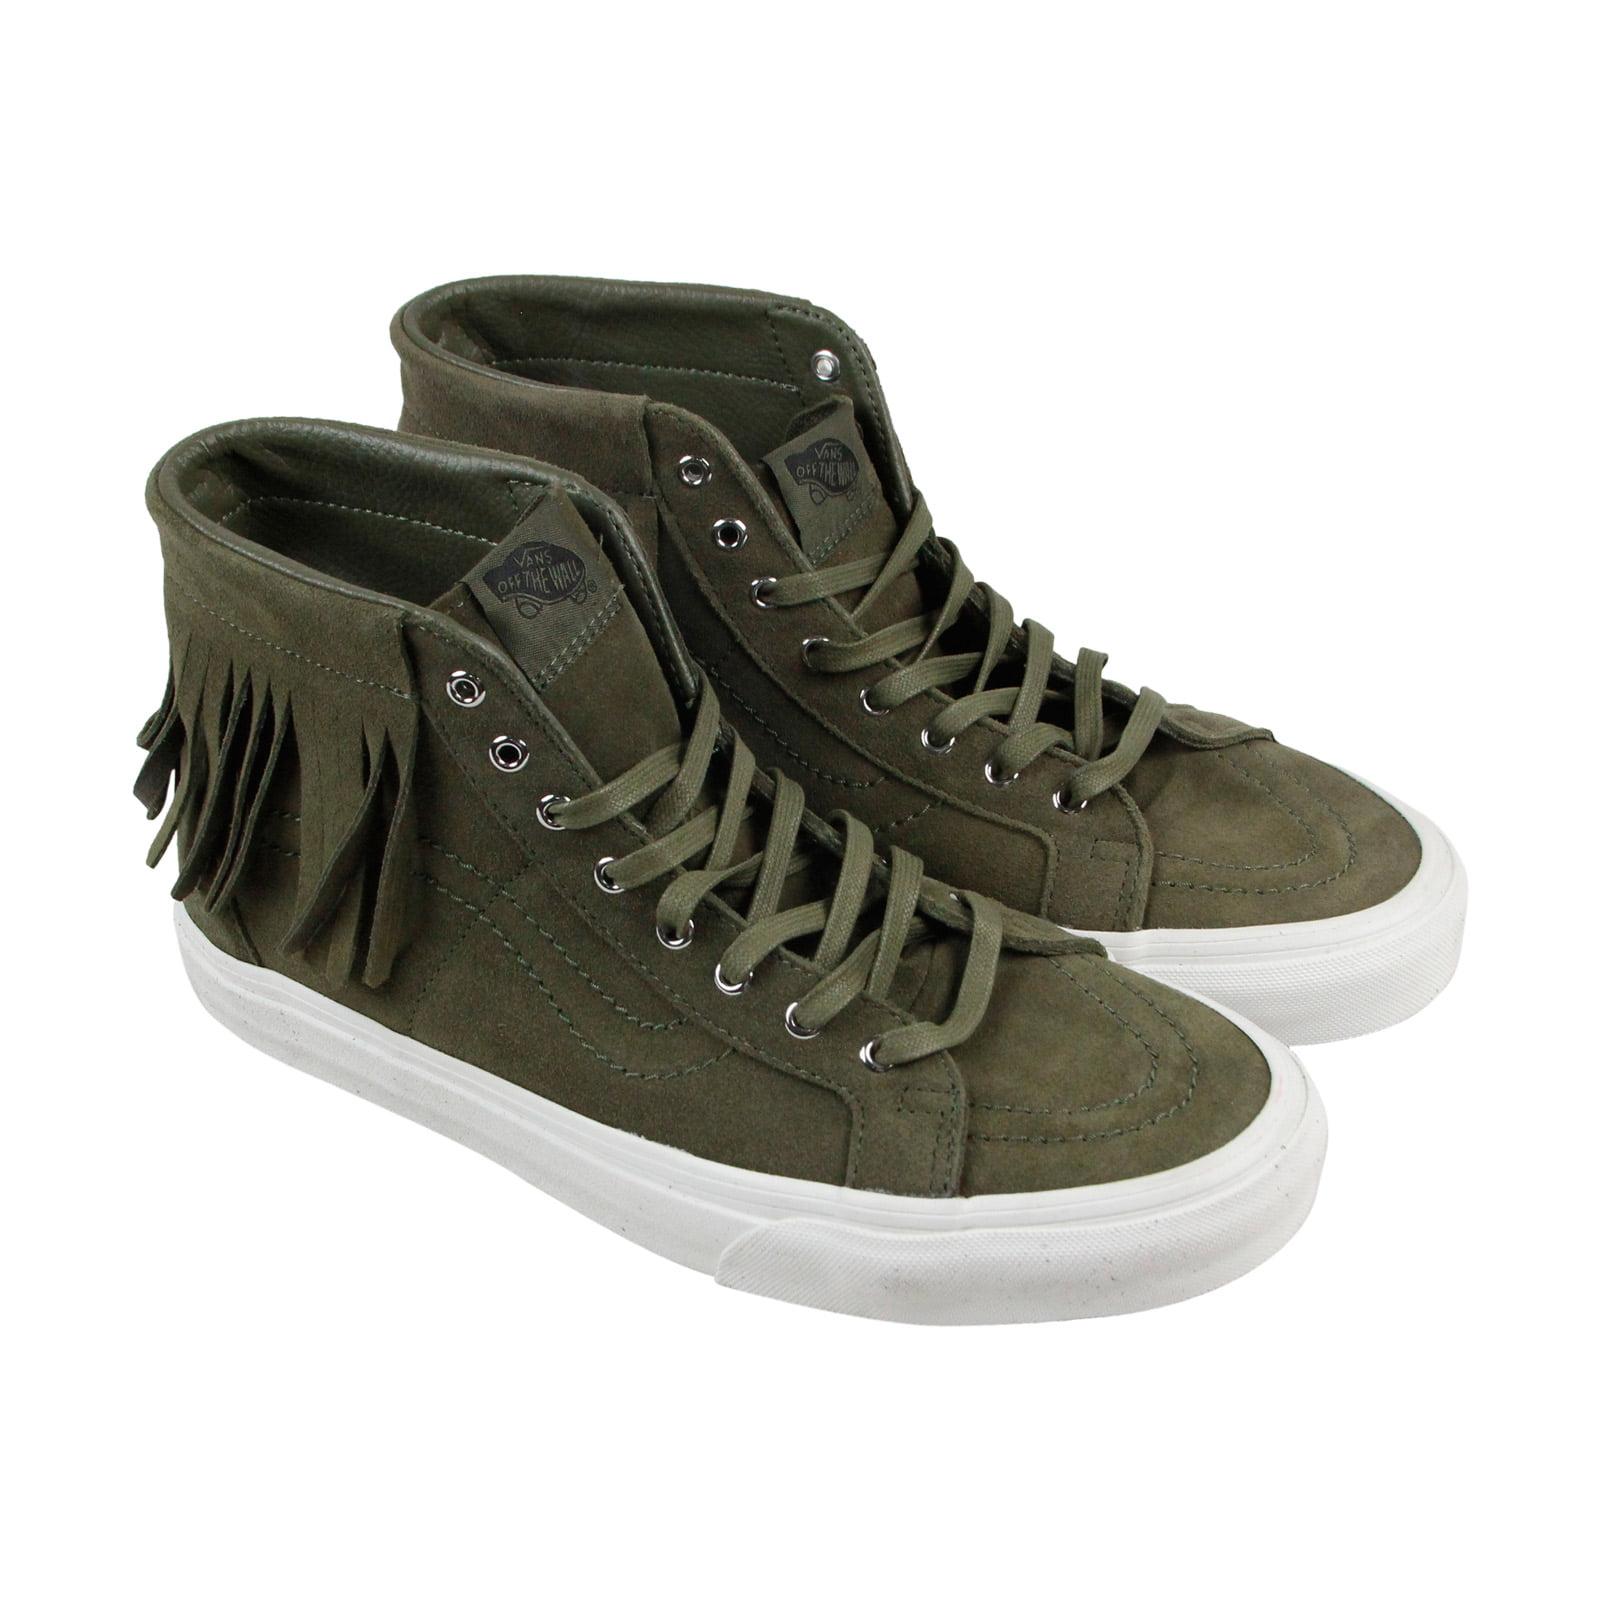 Vans Sk8 Hi Moc Mens Brown Suede High Top Lace Up Sneakers Shoes